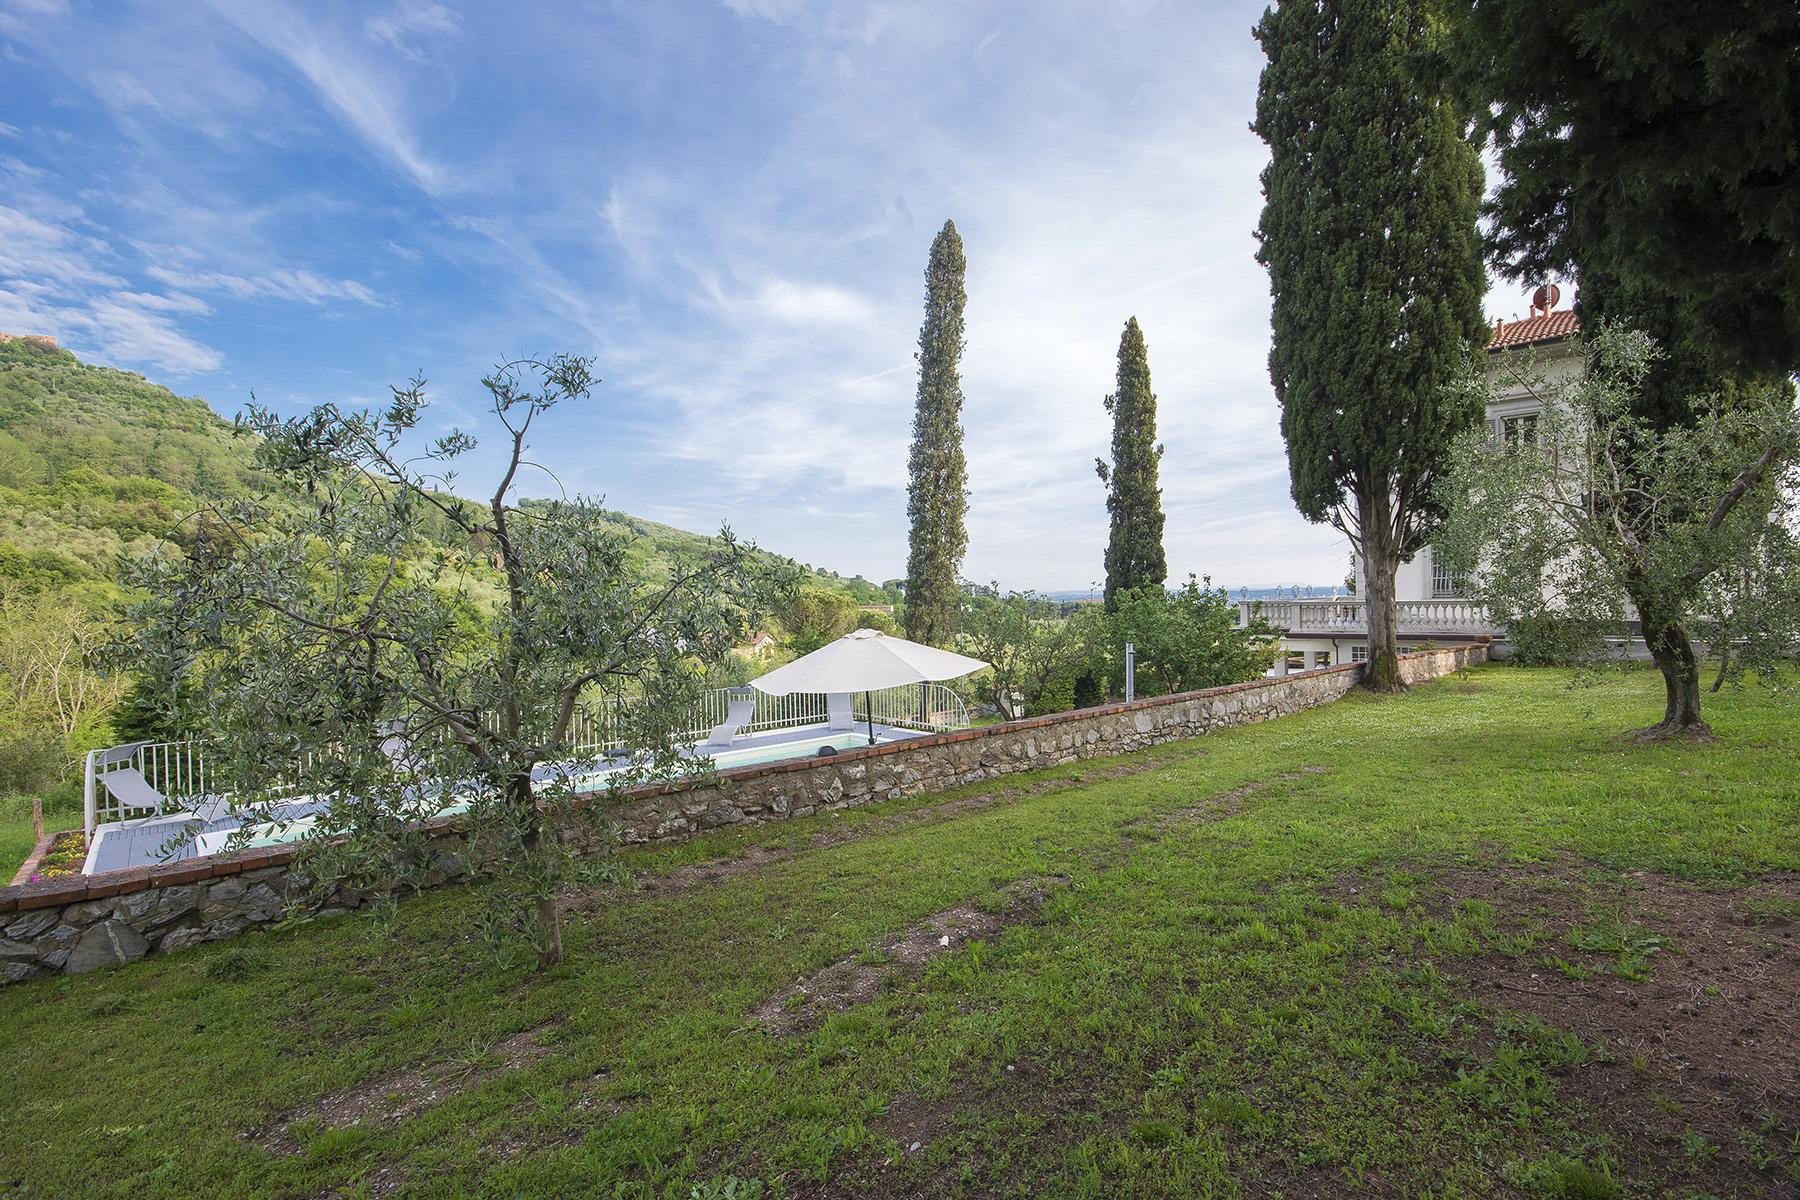 Montecatini Terme小镇优雅的新艺术风格的别墅 - 33